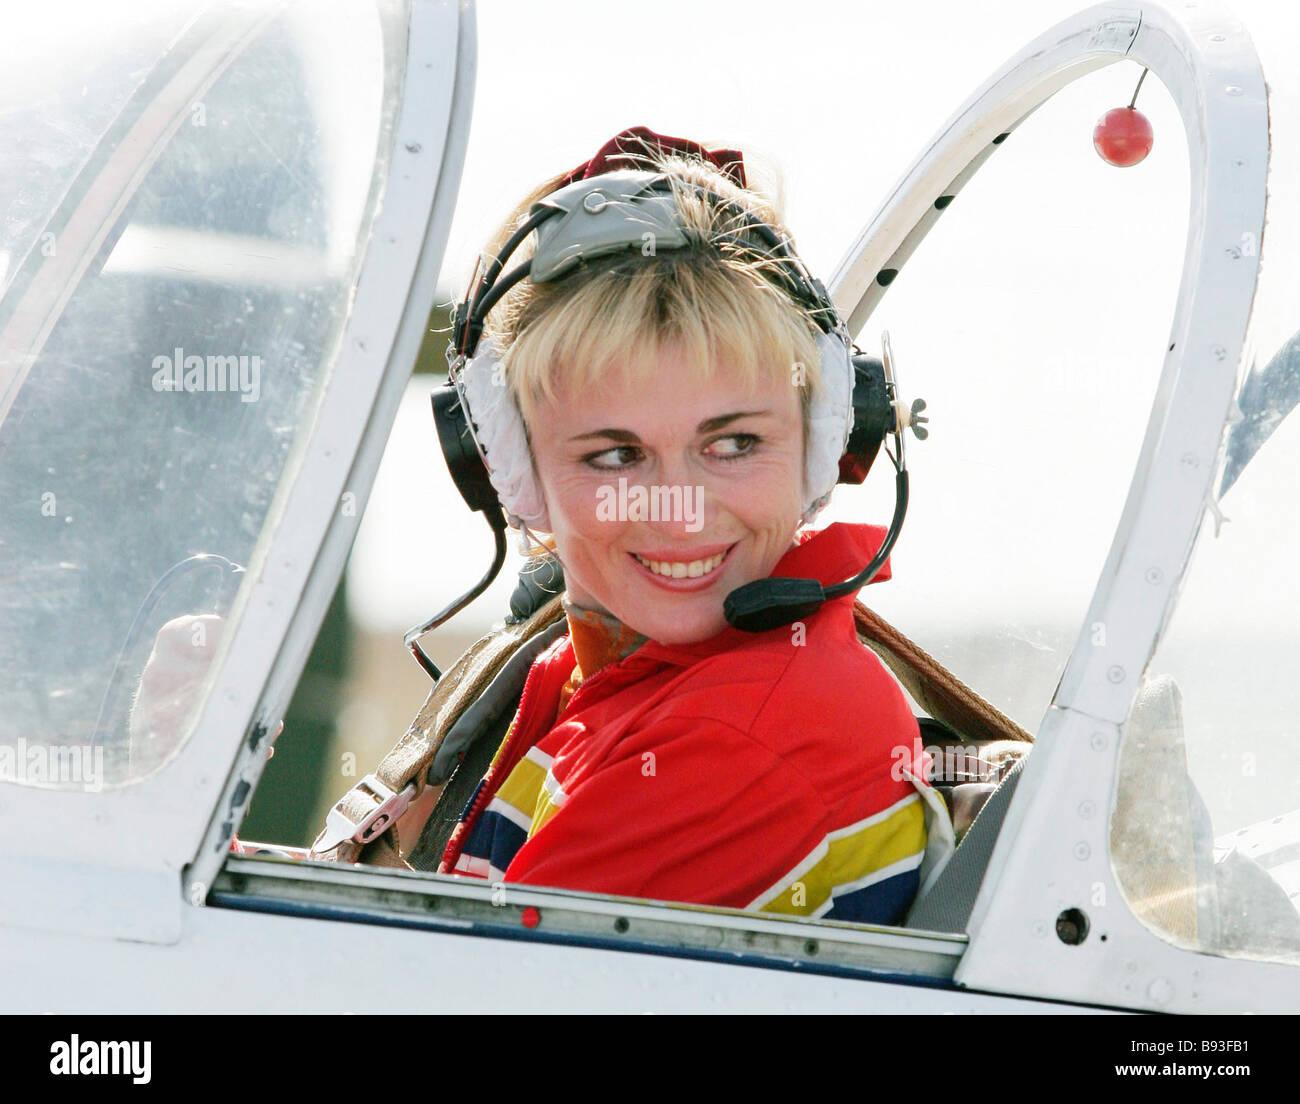 Svetlana Kapanina six time world aerobatics champion piloting piston powered aircrafts - Stock Image